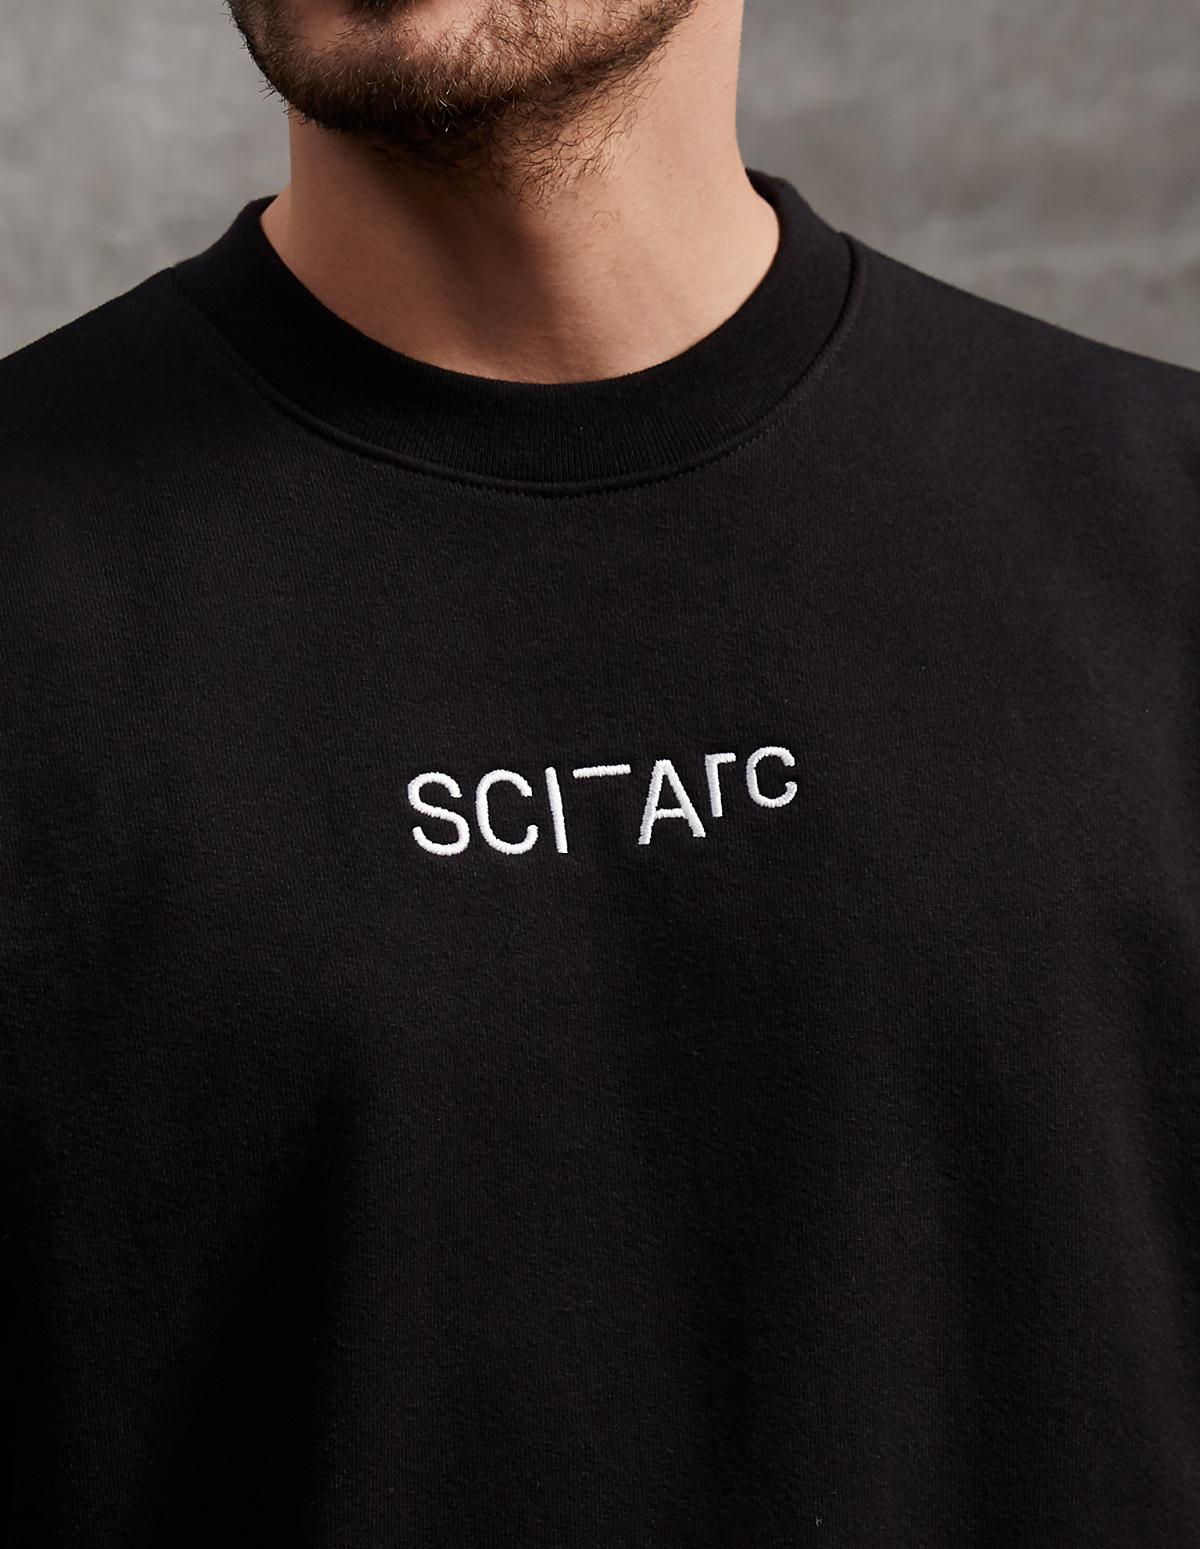 sci arc black crew neck